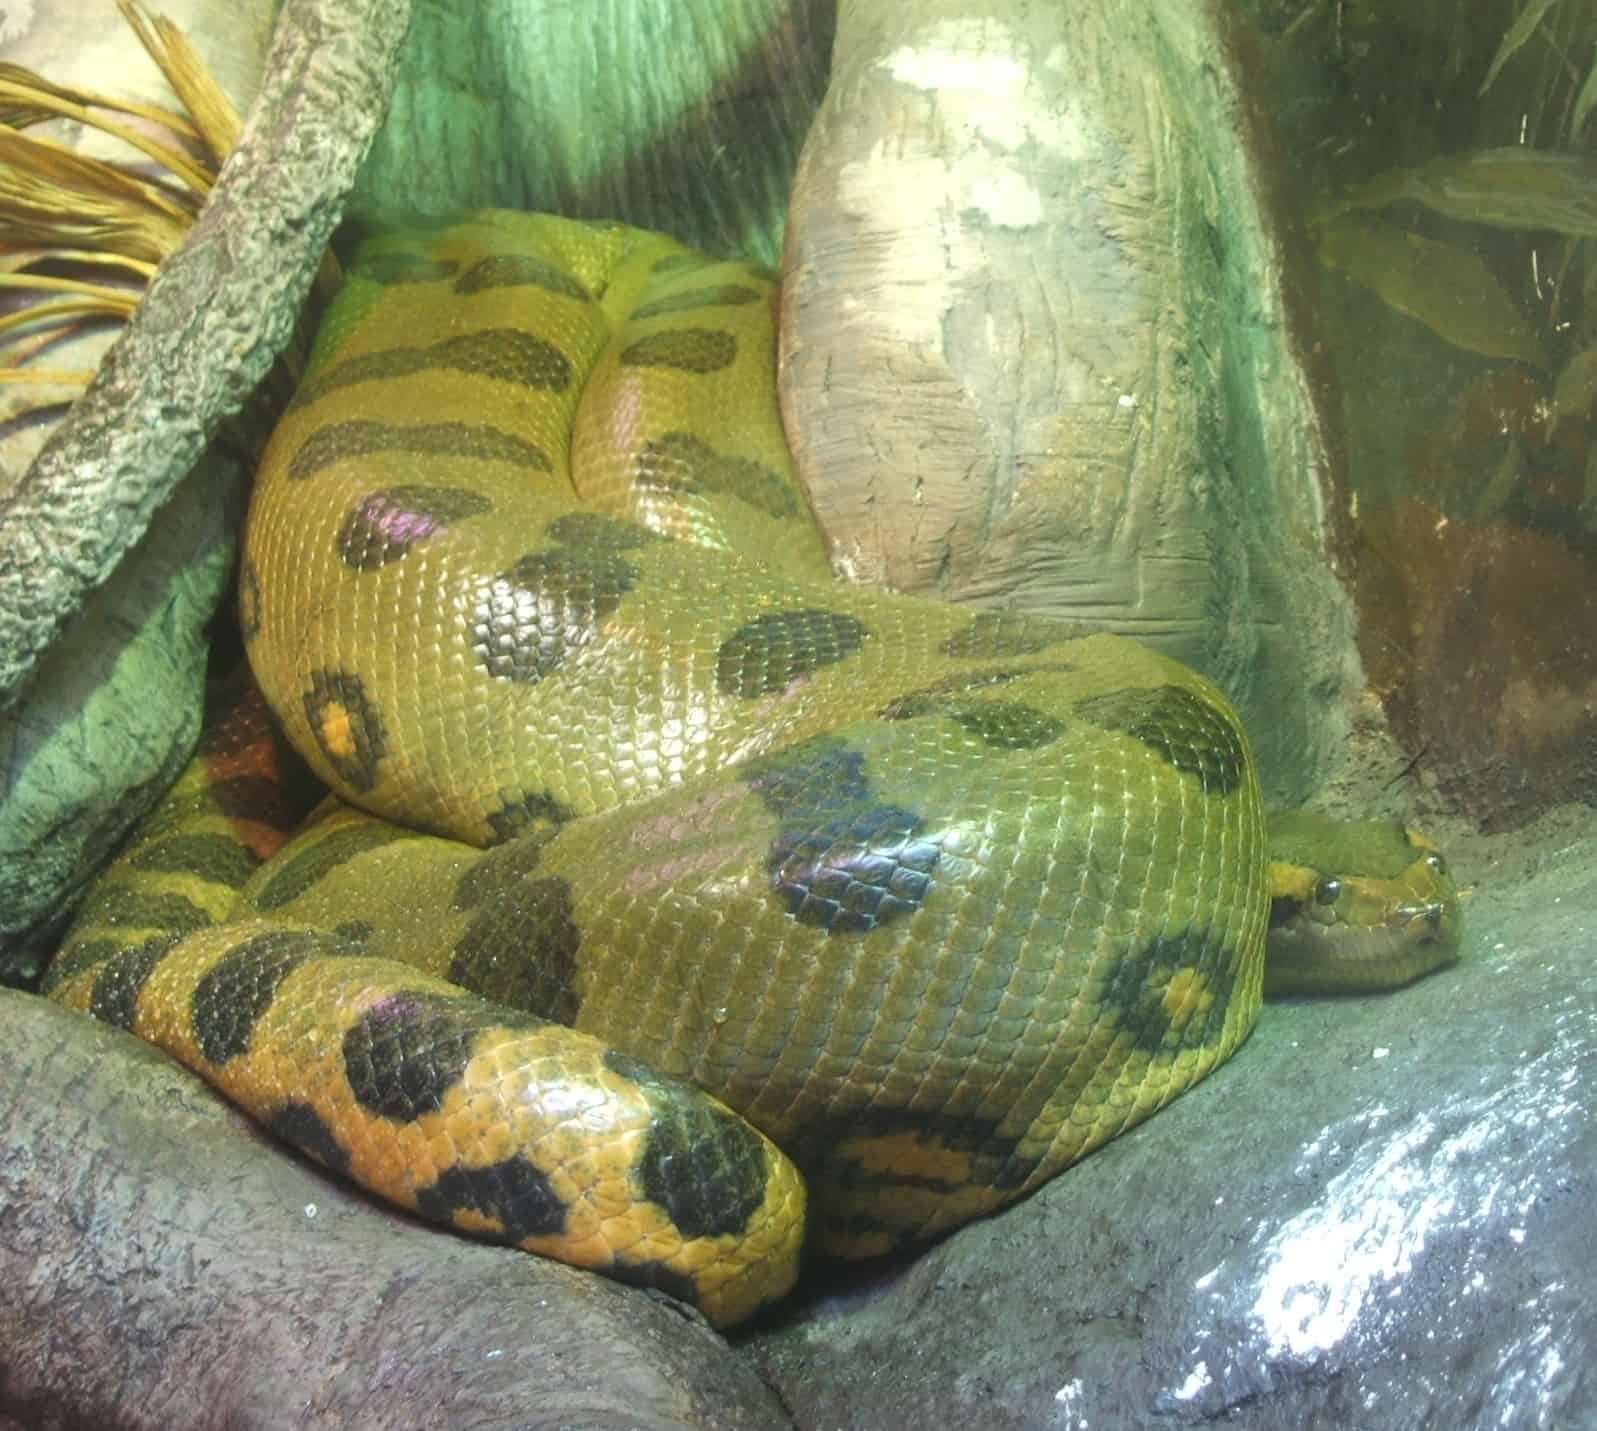 How long is Green Anaconda?